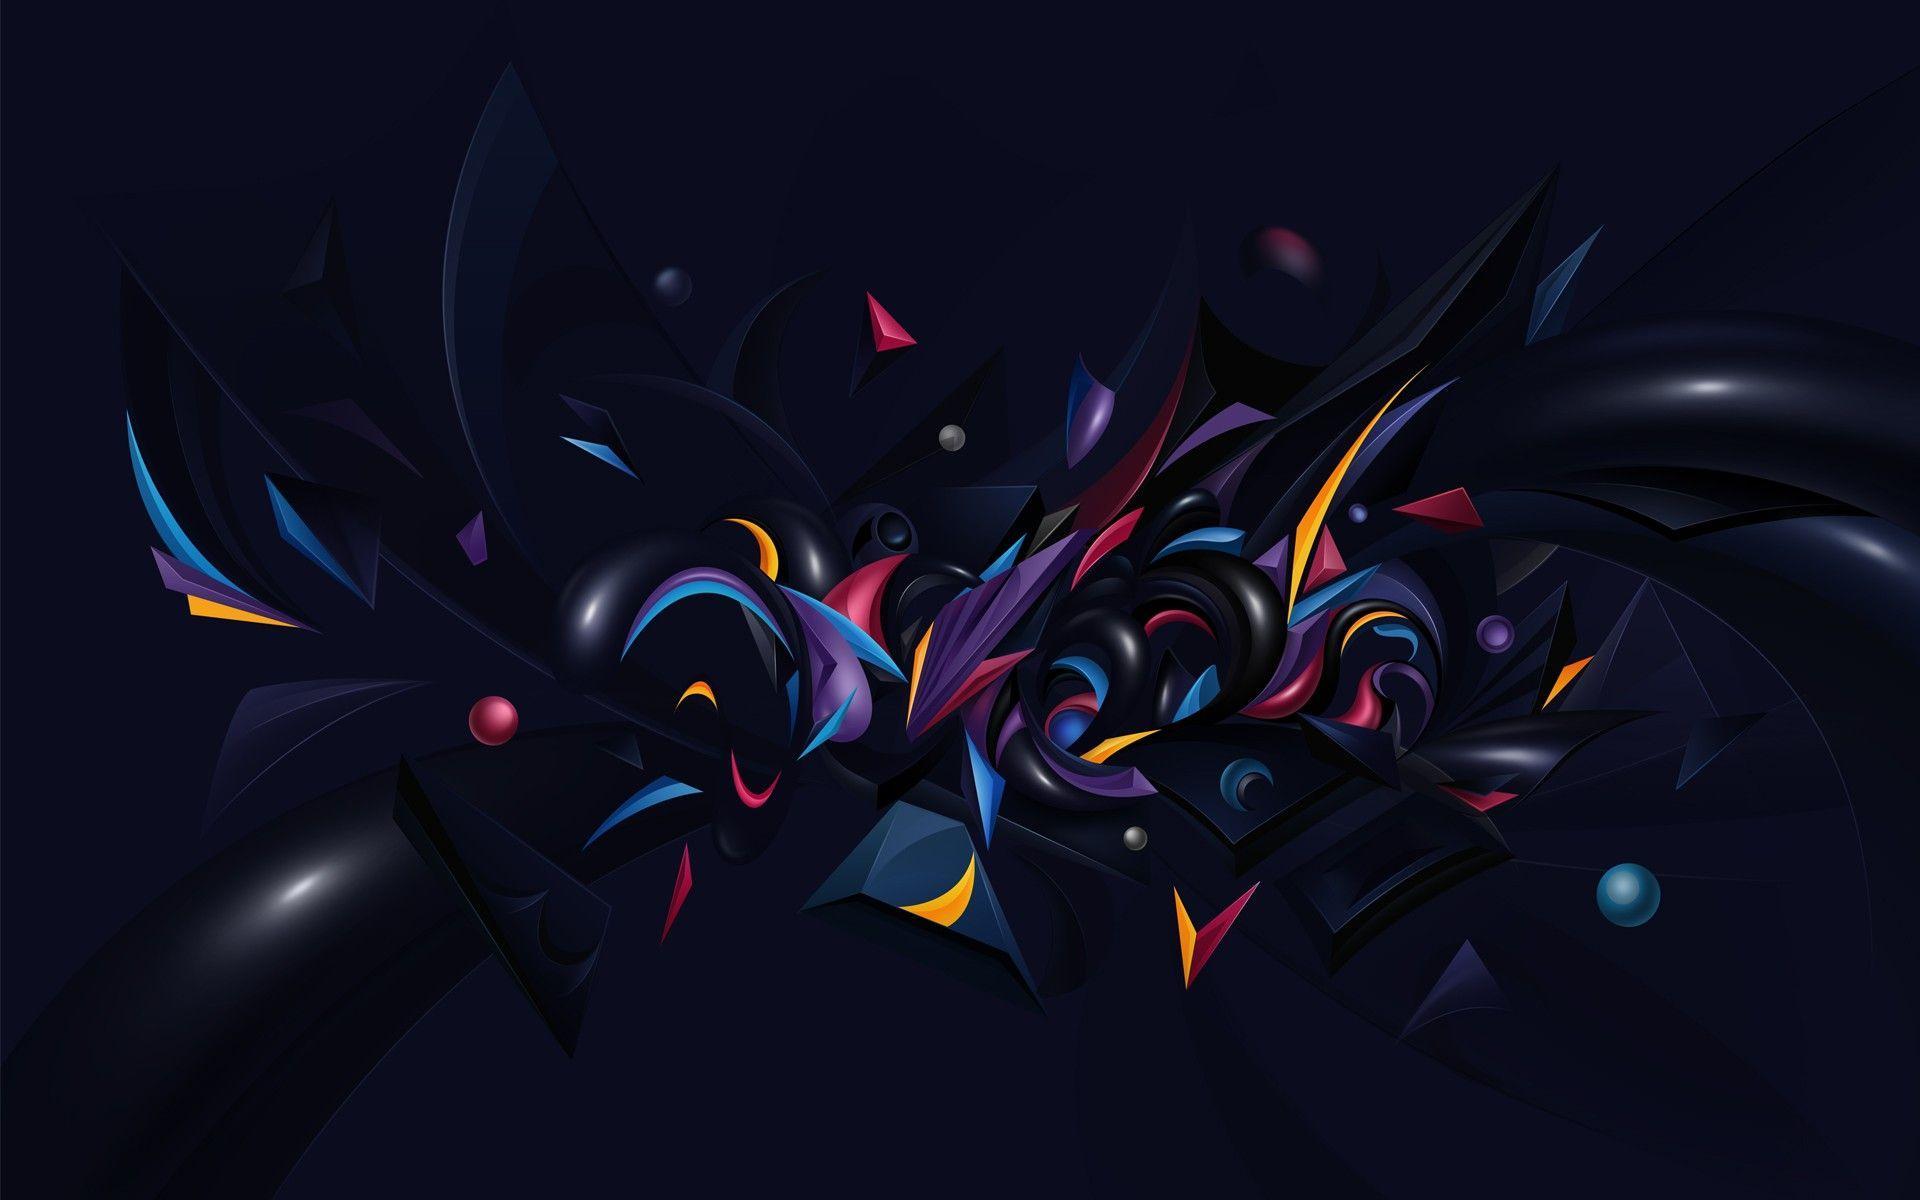 3D Desktop Wallpapers HD - Wallpaper Cave